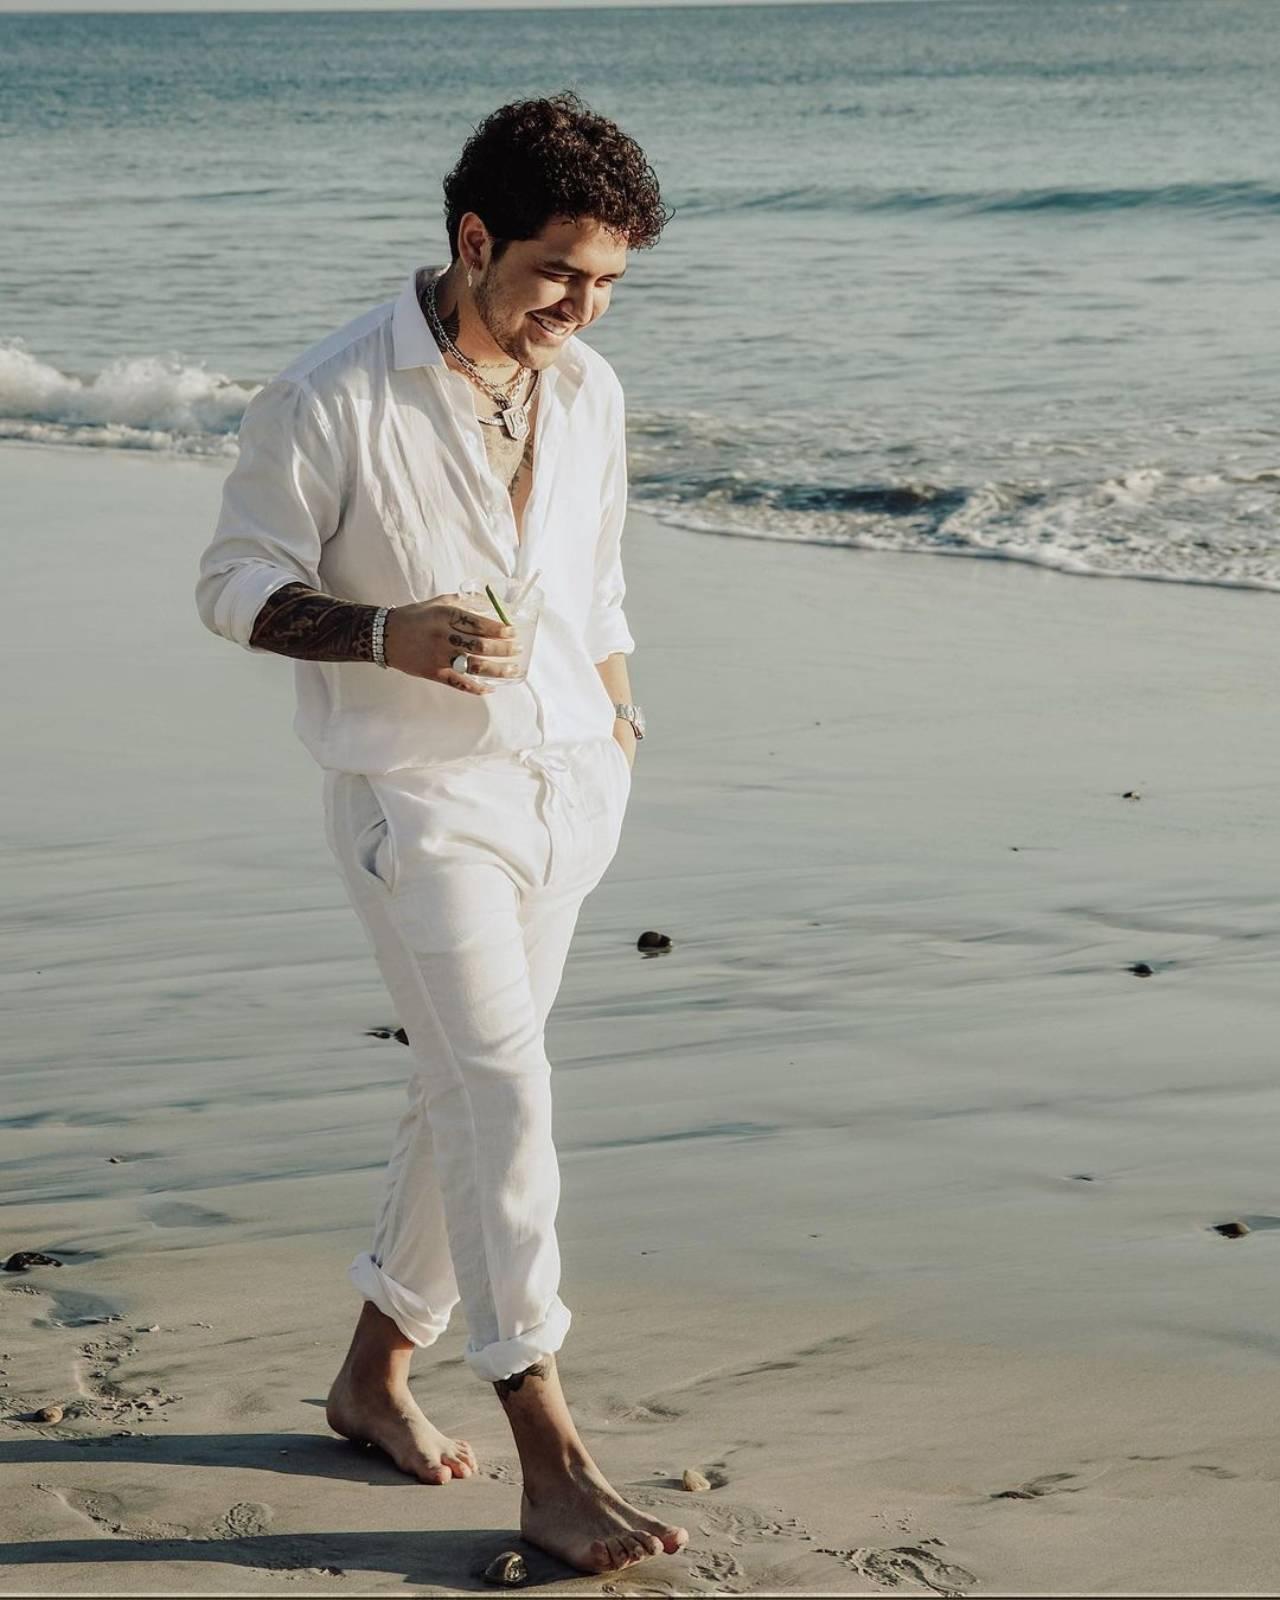 Christian Nodal vestido de blanco